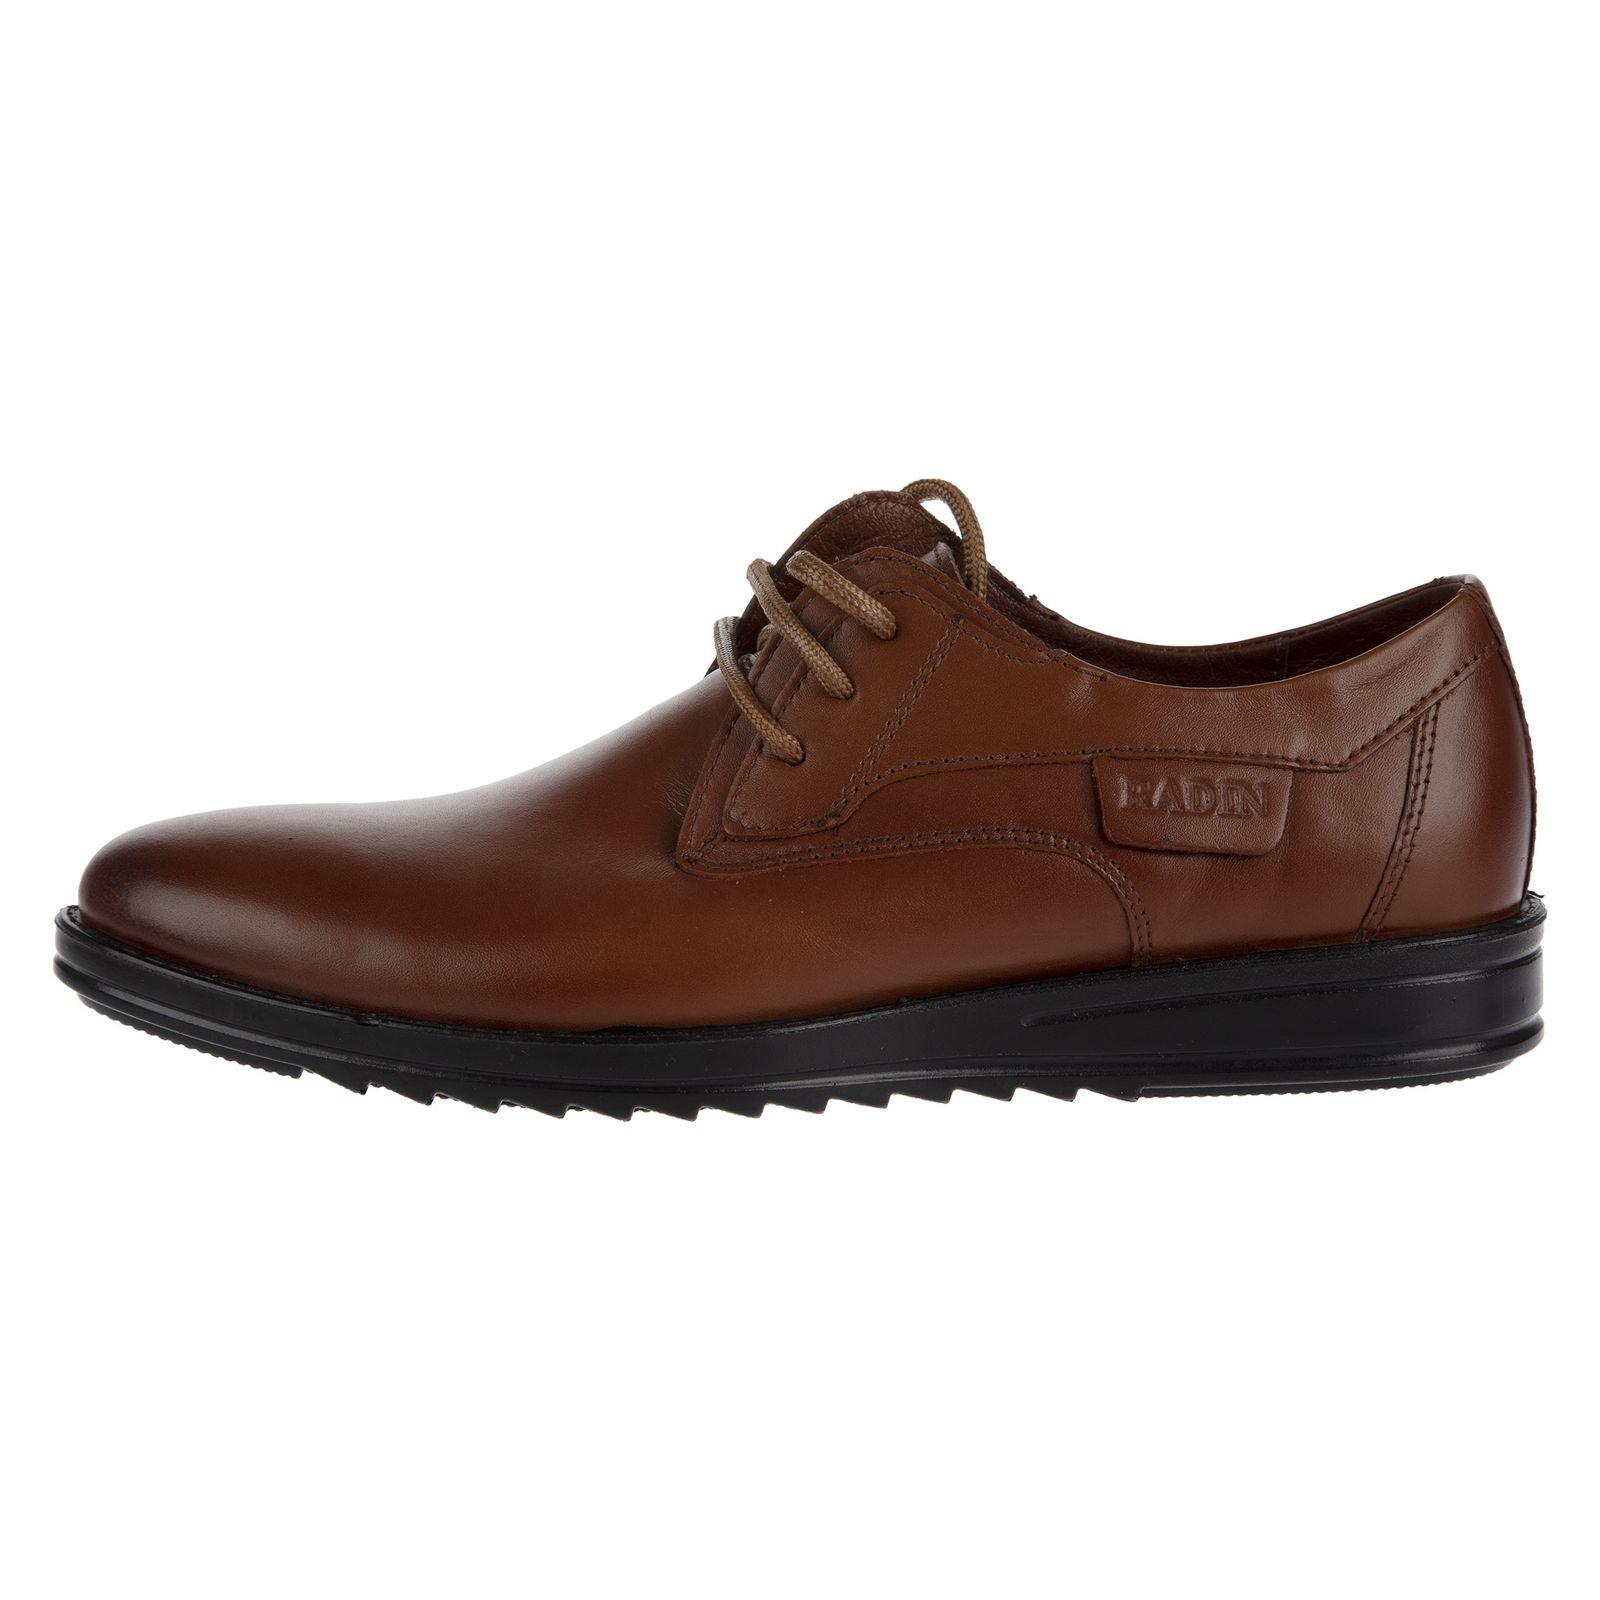 کفش روزمره مردانه رادین کد 1986-3 -  - 2